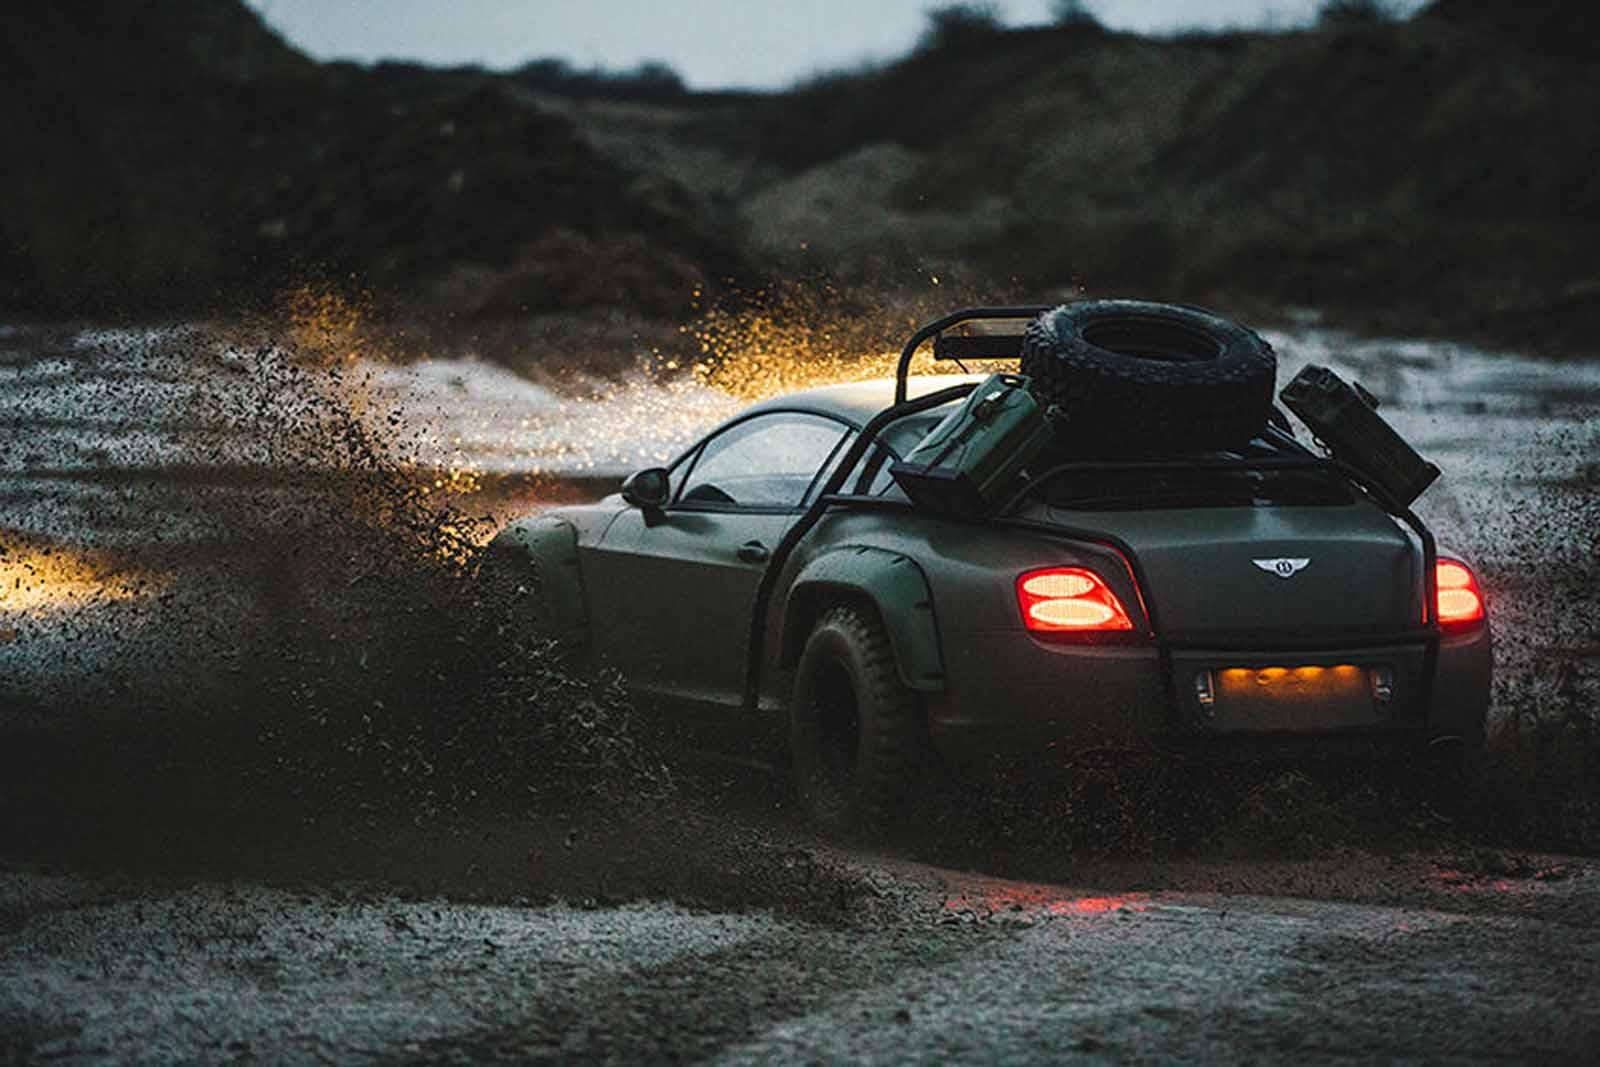 Off-road Bentley Continental GT